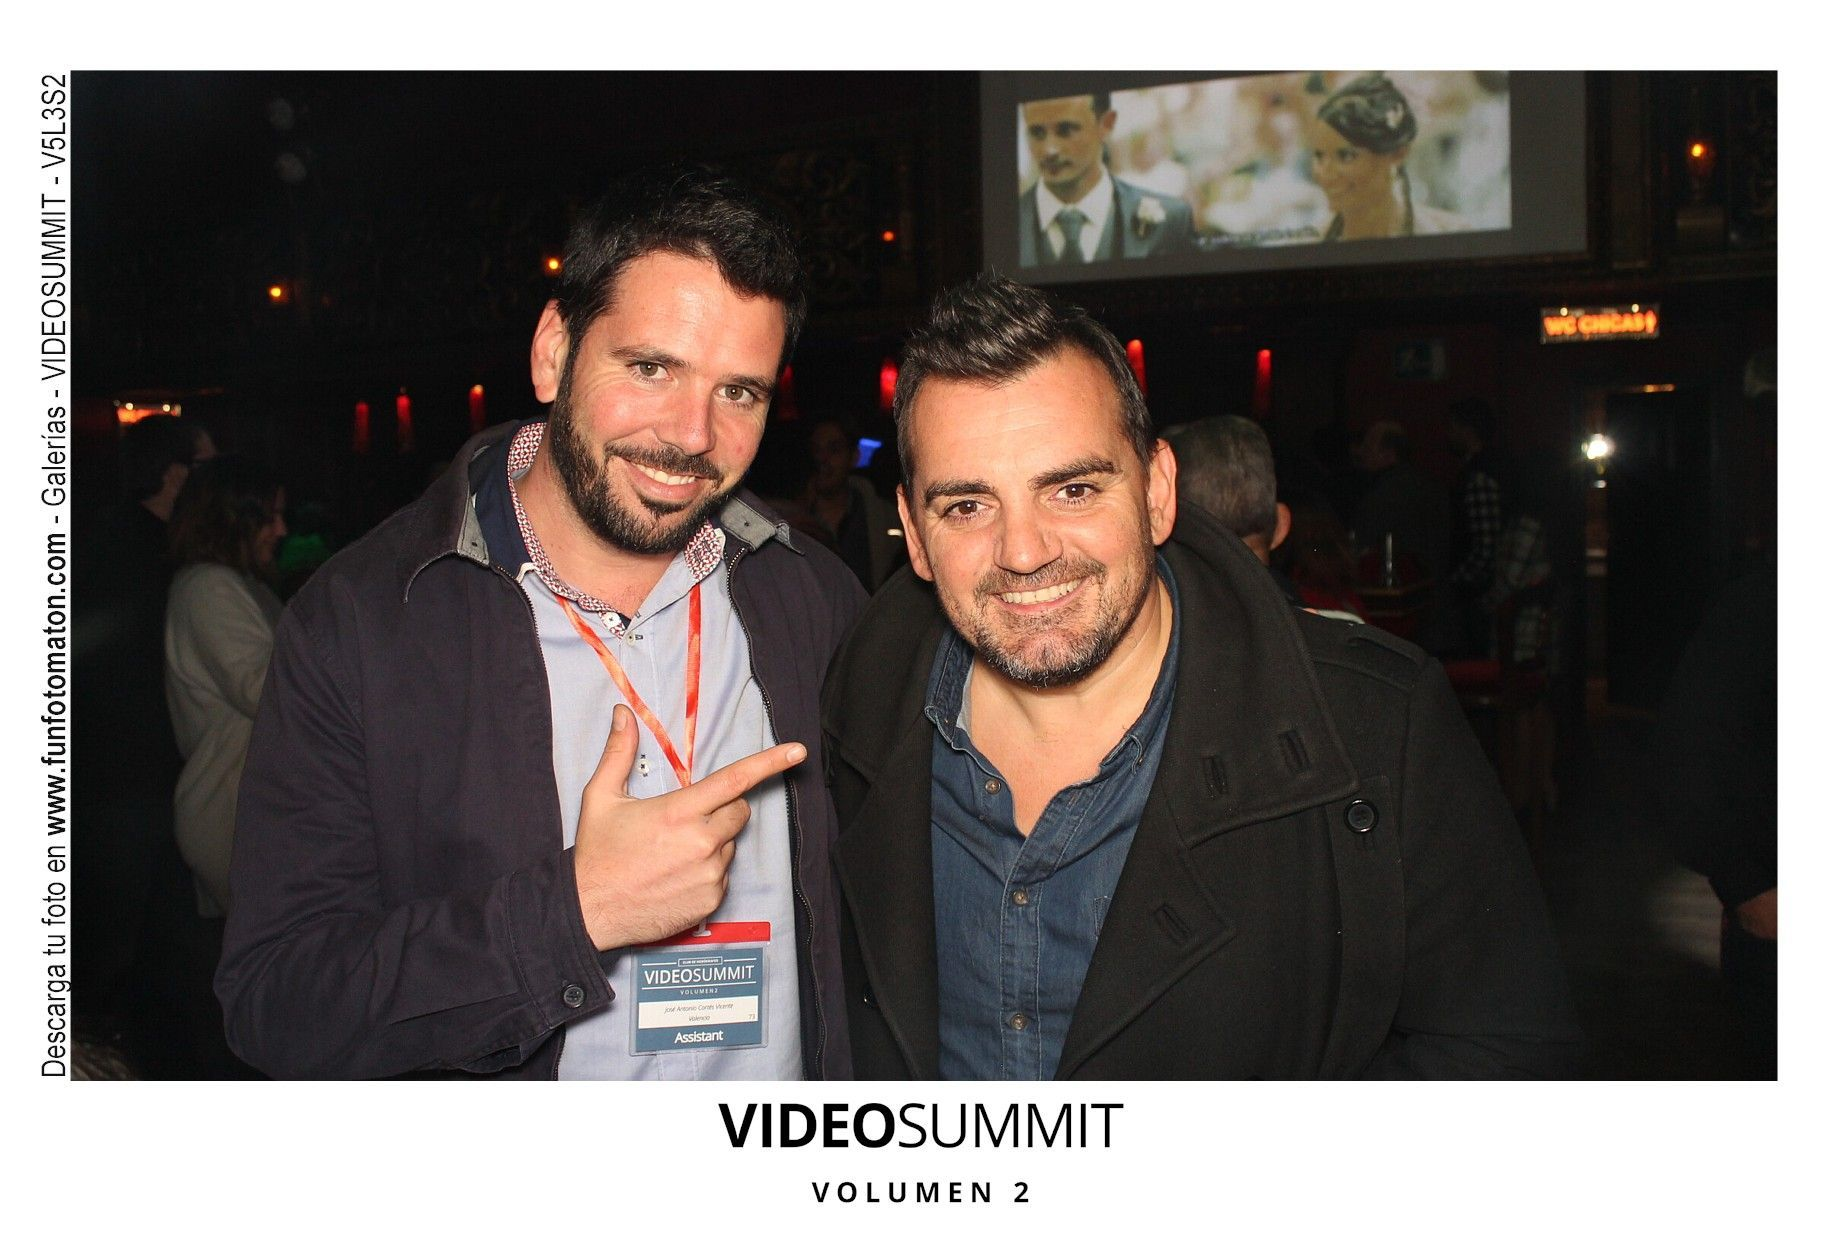 videosummit-vol2-club-party-034